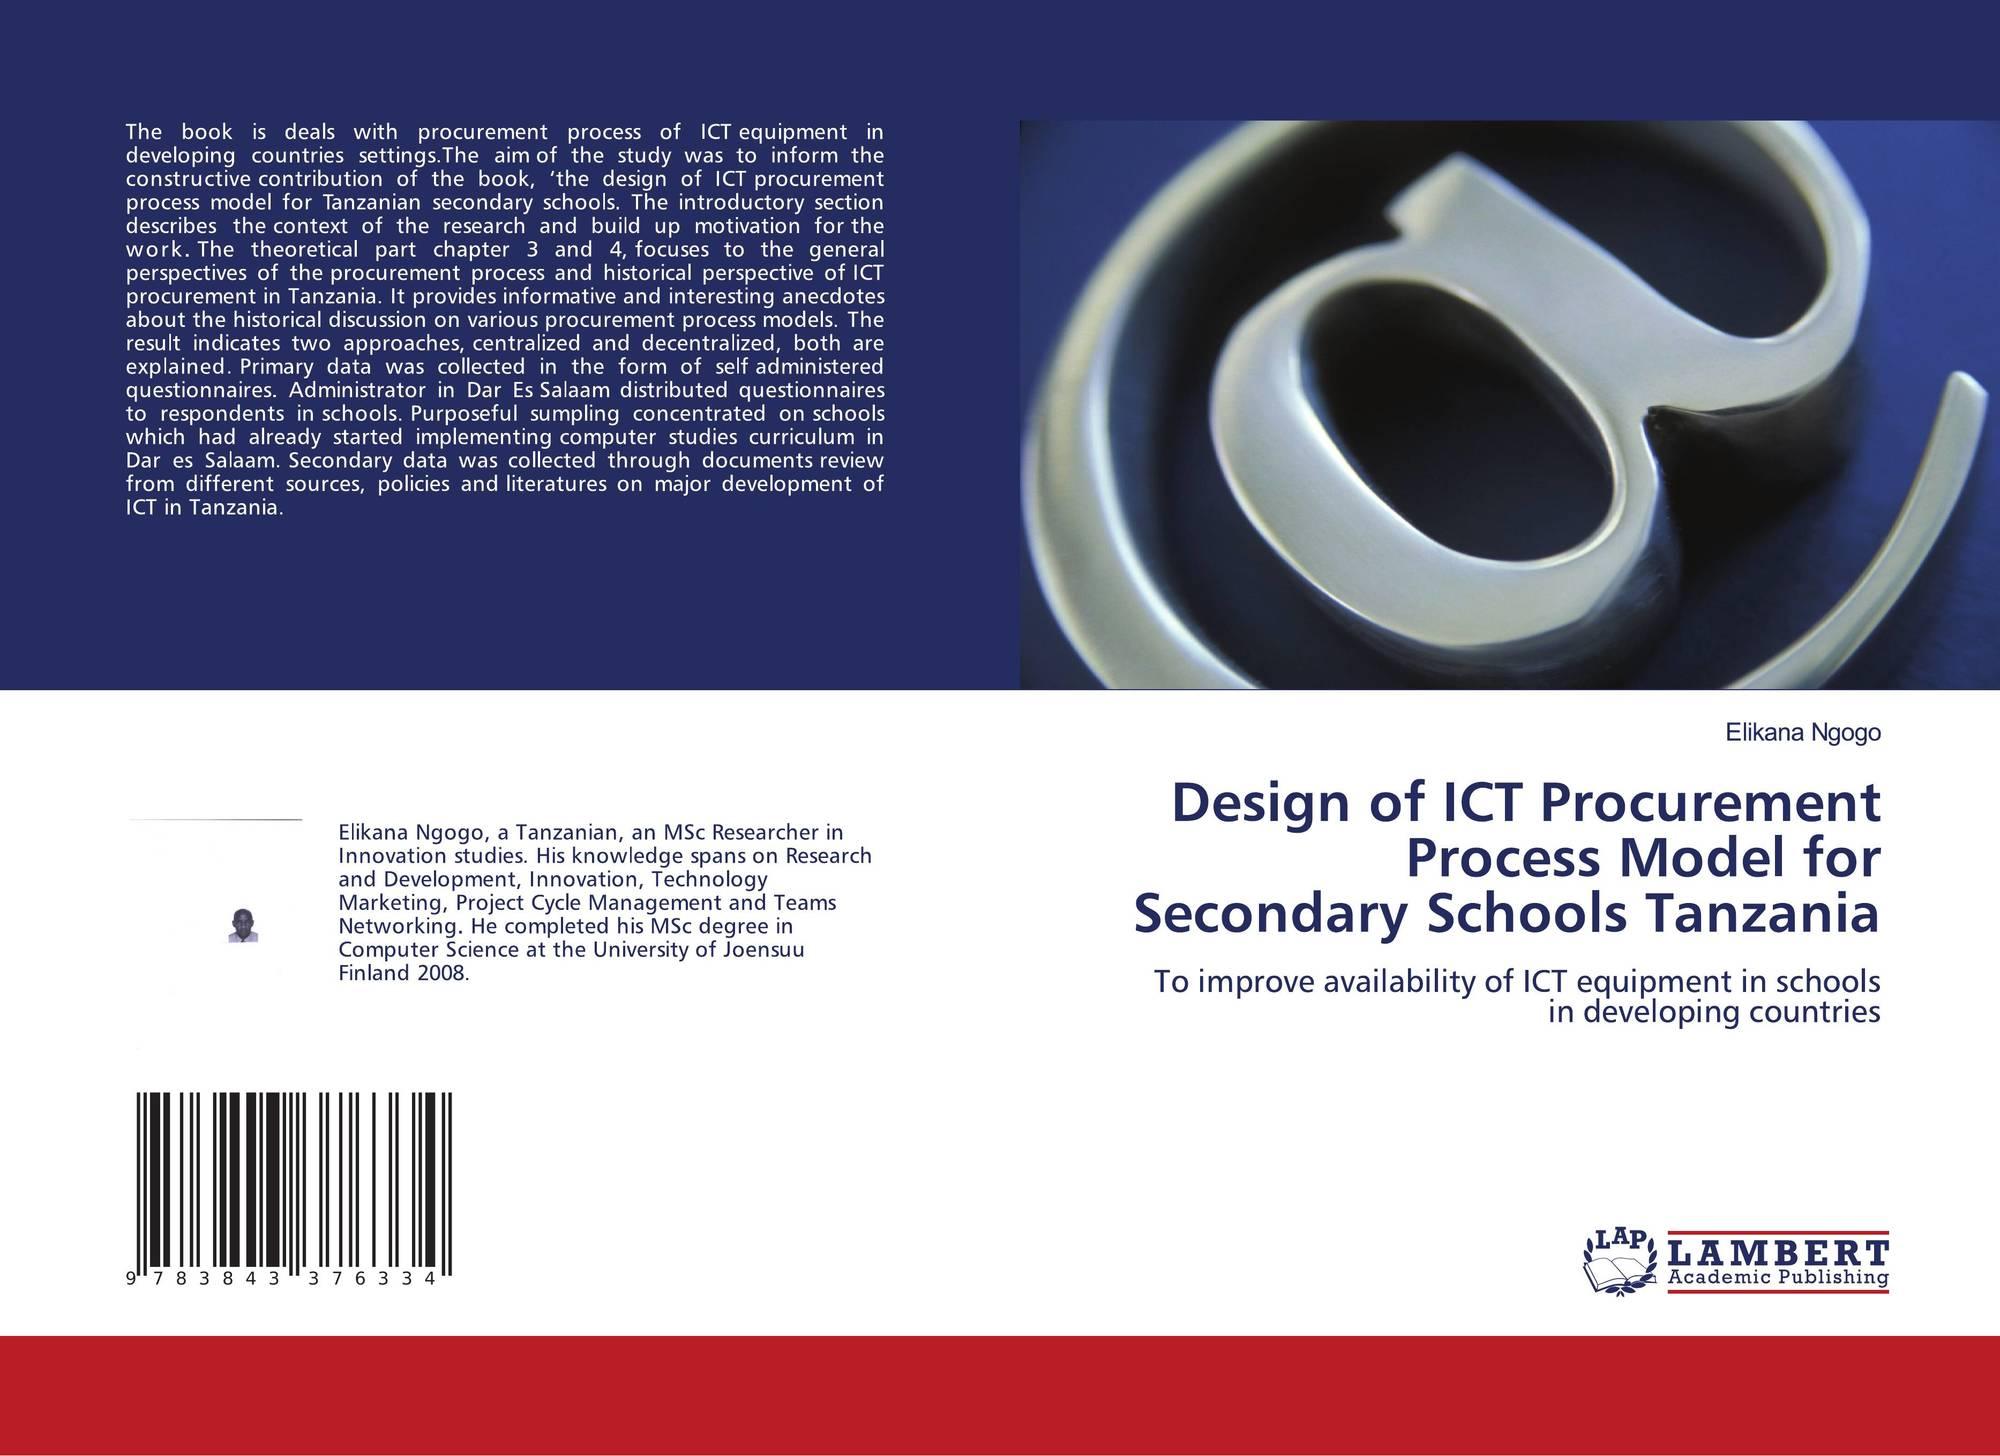 Design of ICT Procurement Process Model for Secondary